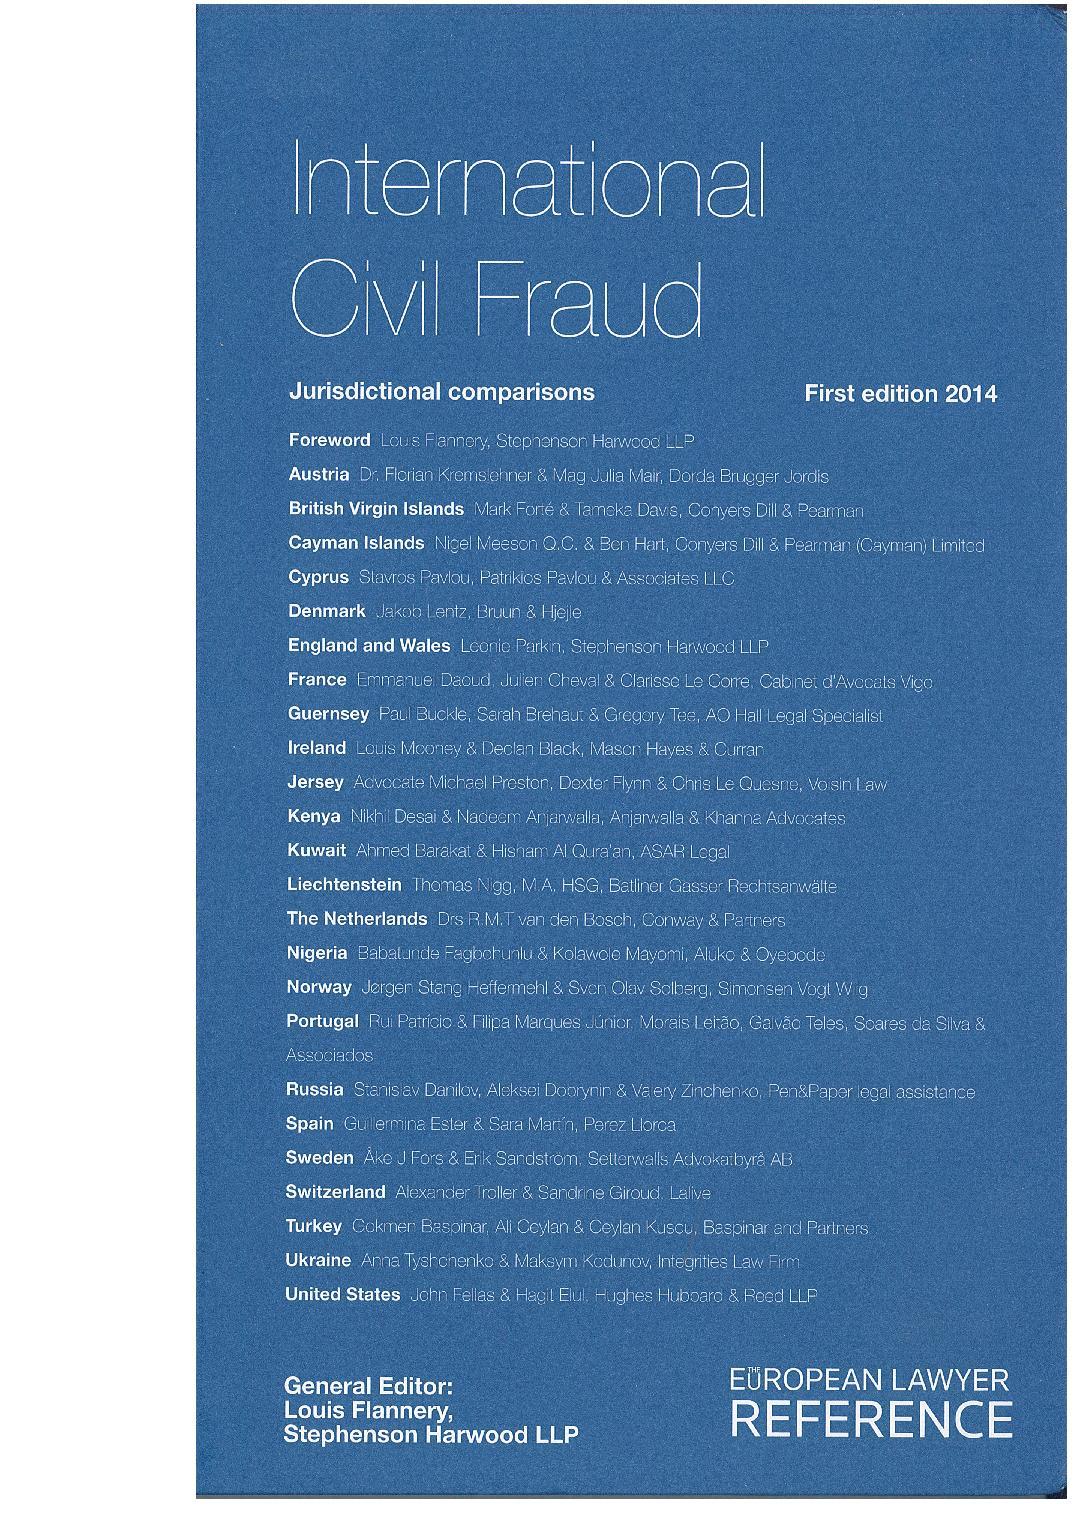 International Civil Fraud – Cyprus Chapter 2014